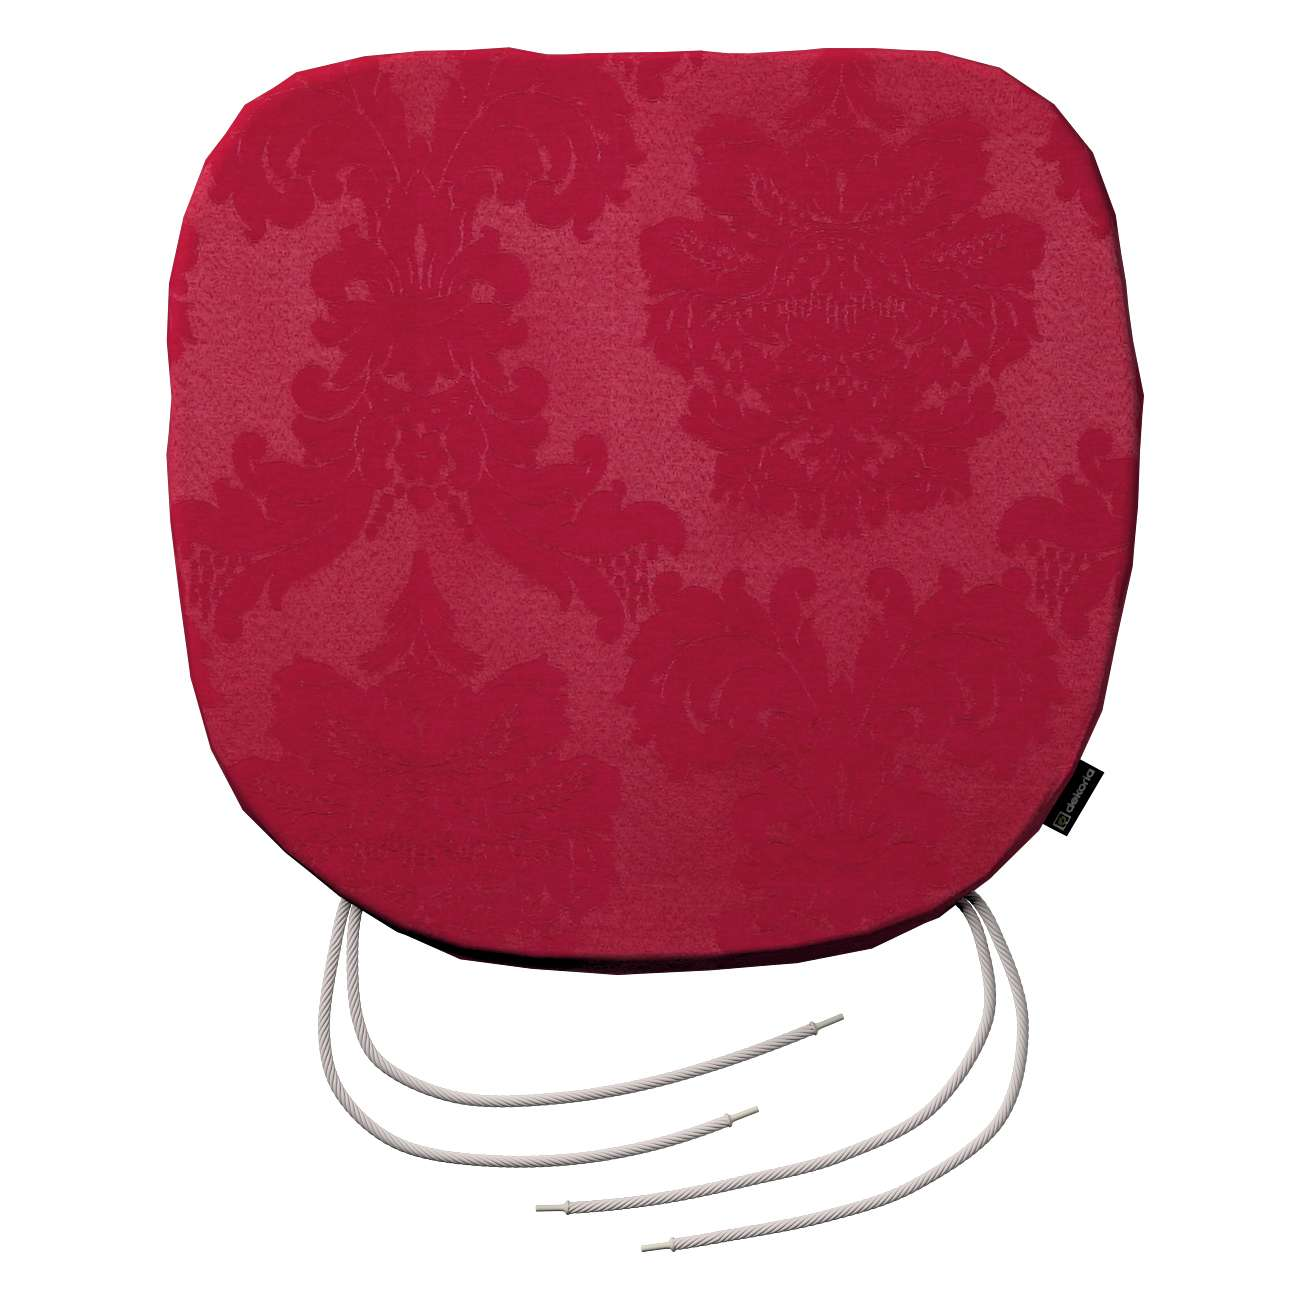 Kėdės pagalvėlė Bartek  40 x 37 x 2,5 cm kolekcijoje Damasco, audinys: 613-13